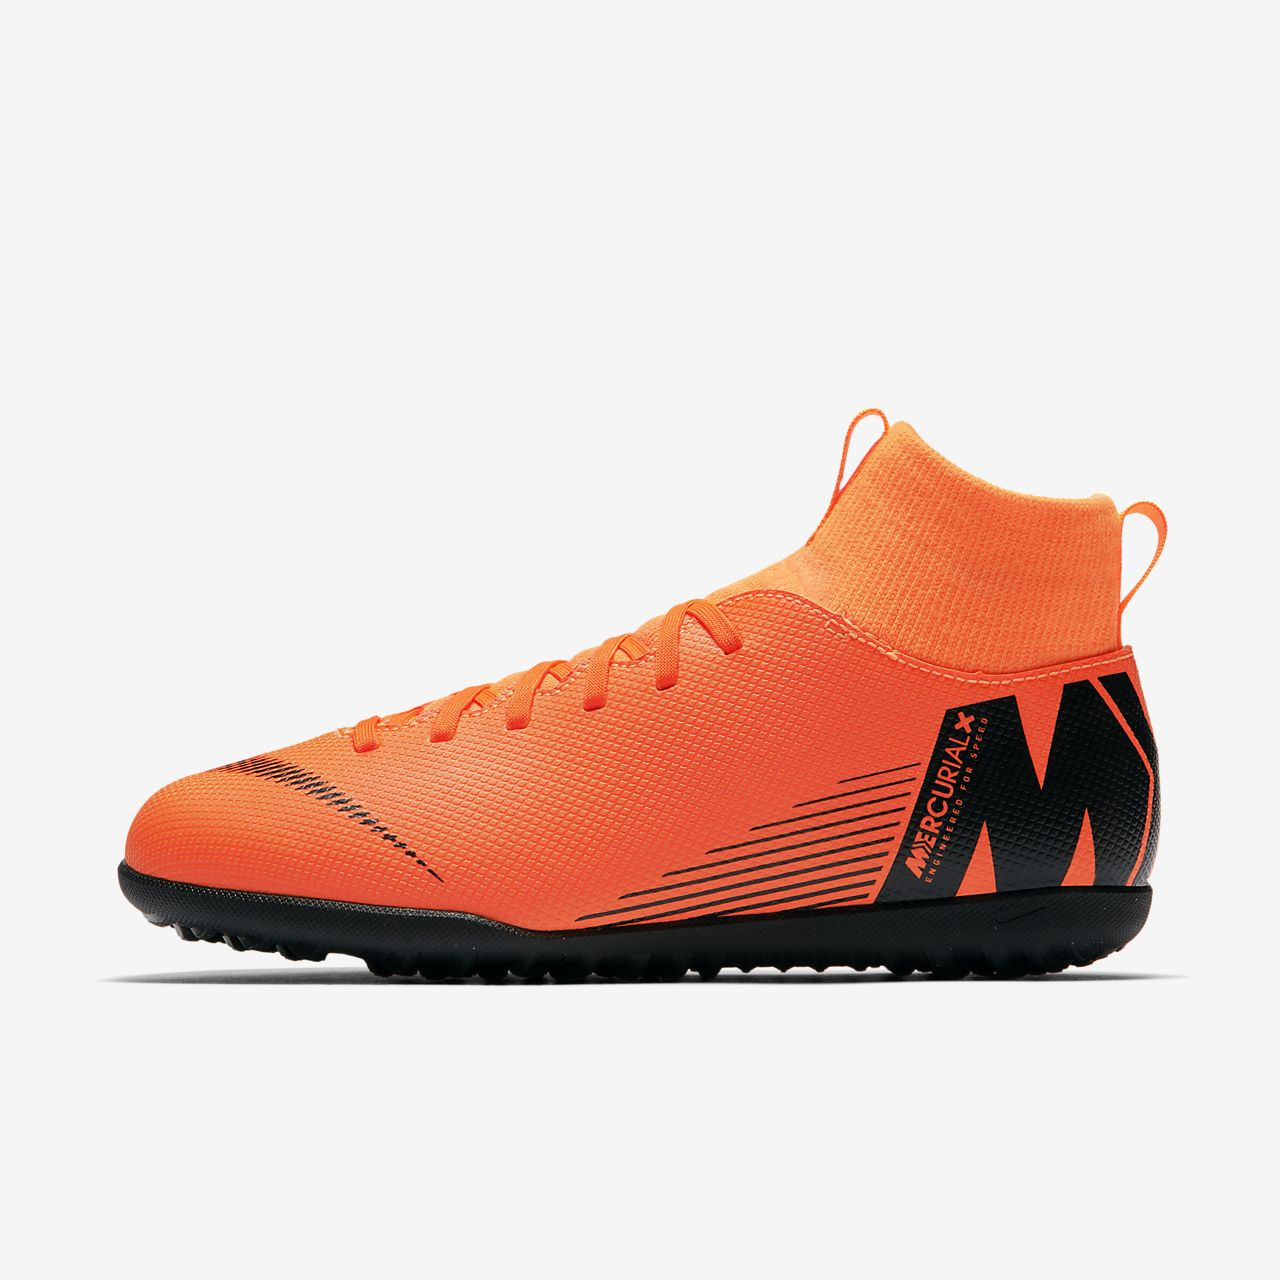 info for 6d270 05139 ... shop 2015 nike mercurial superfly cr7 gold black . nike jr. mercurialx  superfly vi club